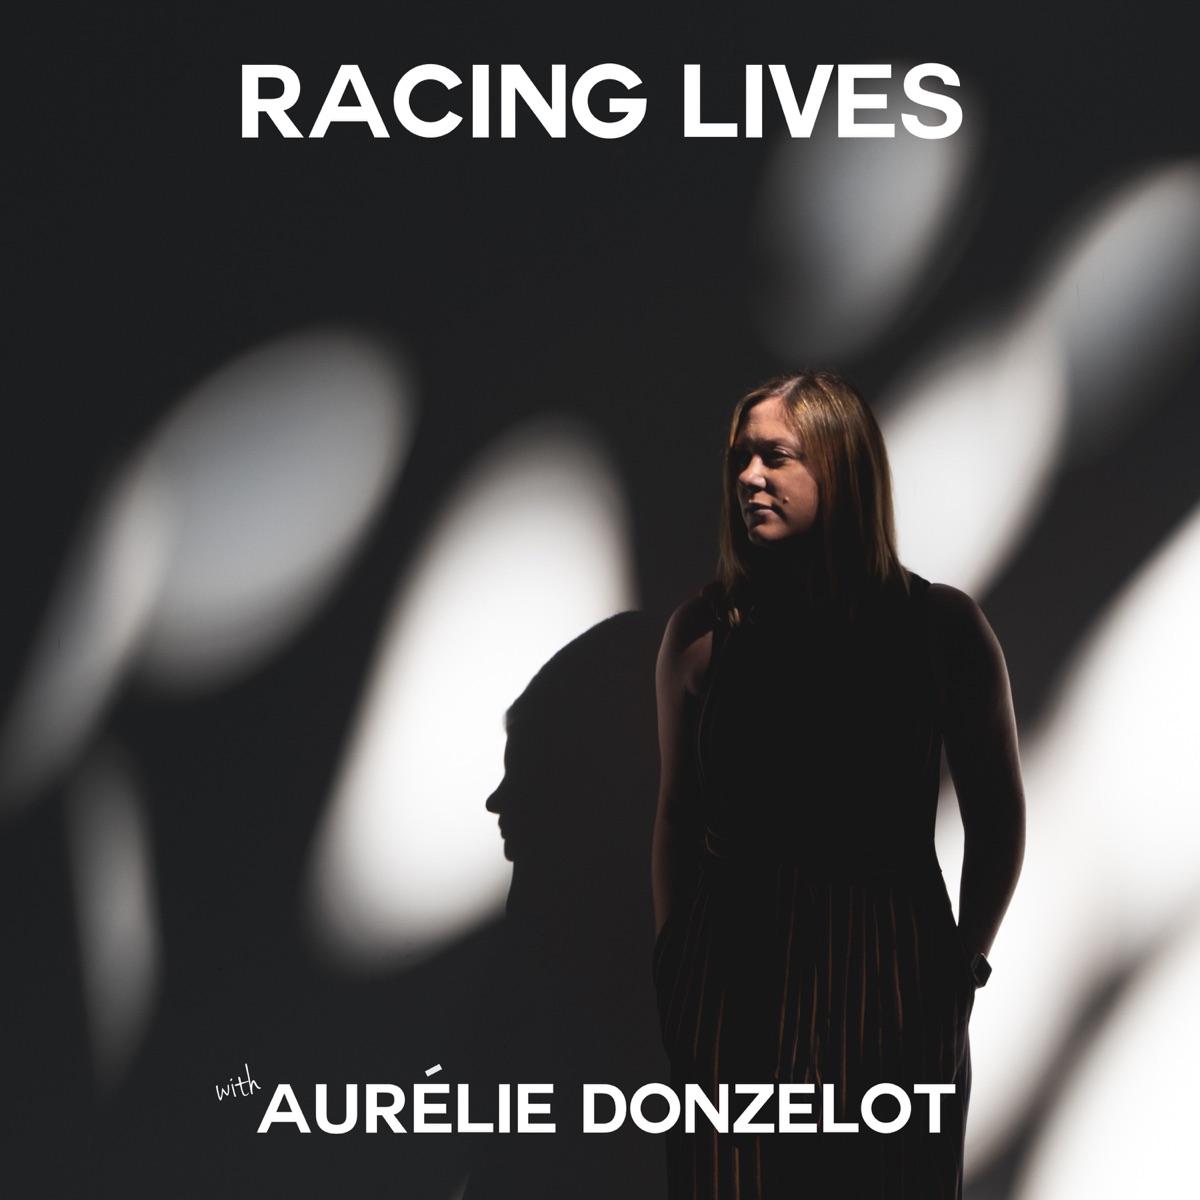 Racing Lives with Aurélie Donzelot